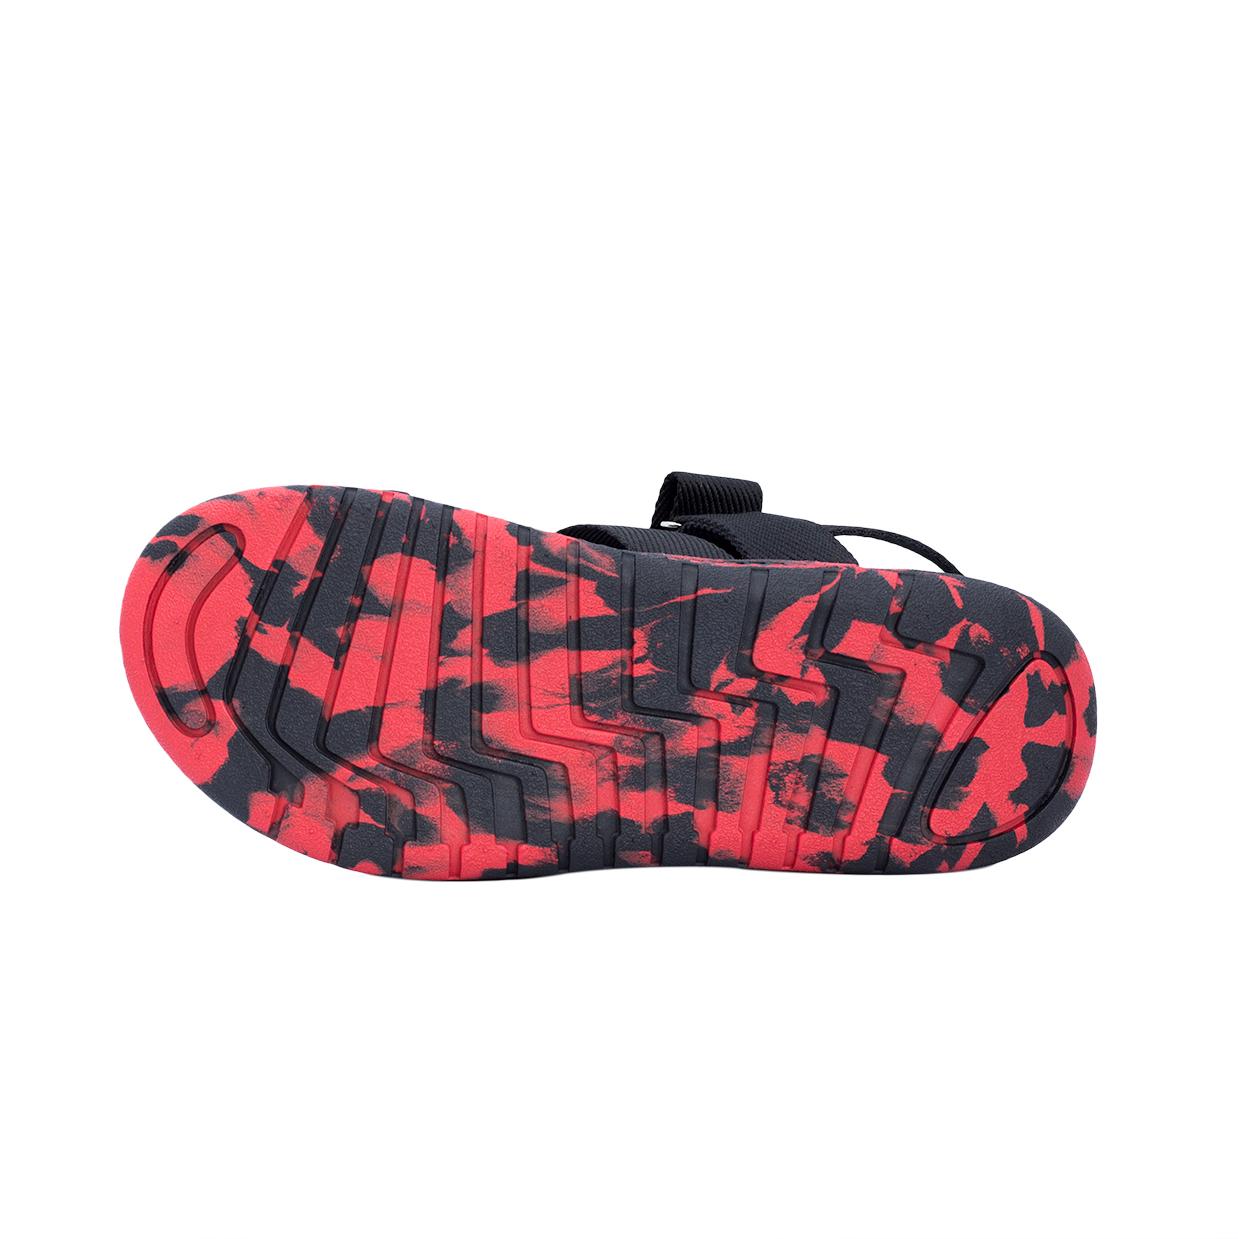 Giày sandal nam Facota V1 Sport HA13 sandal quai chéo camo - sandal quai dù